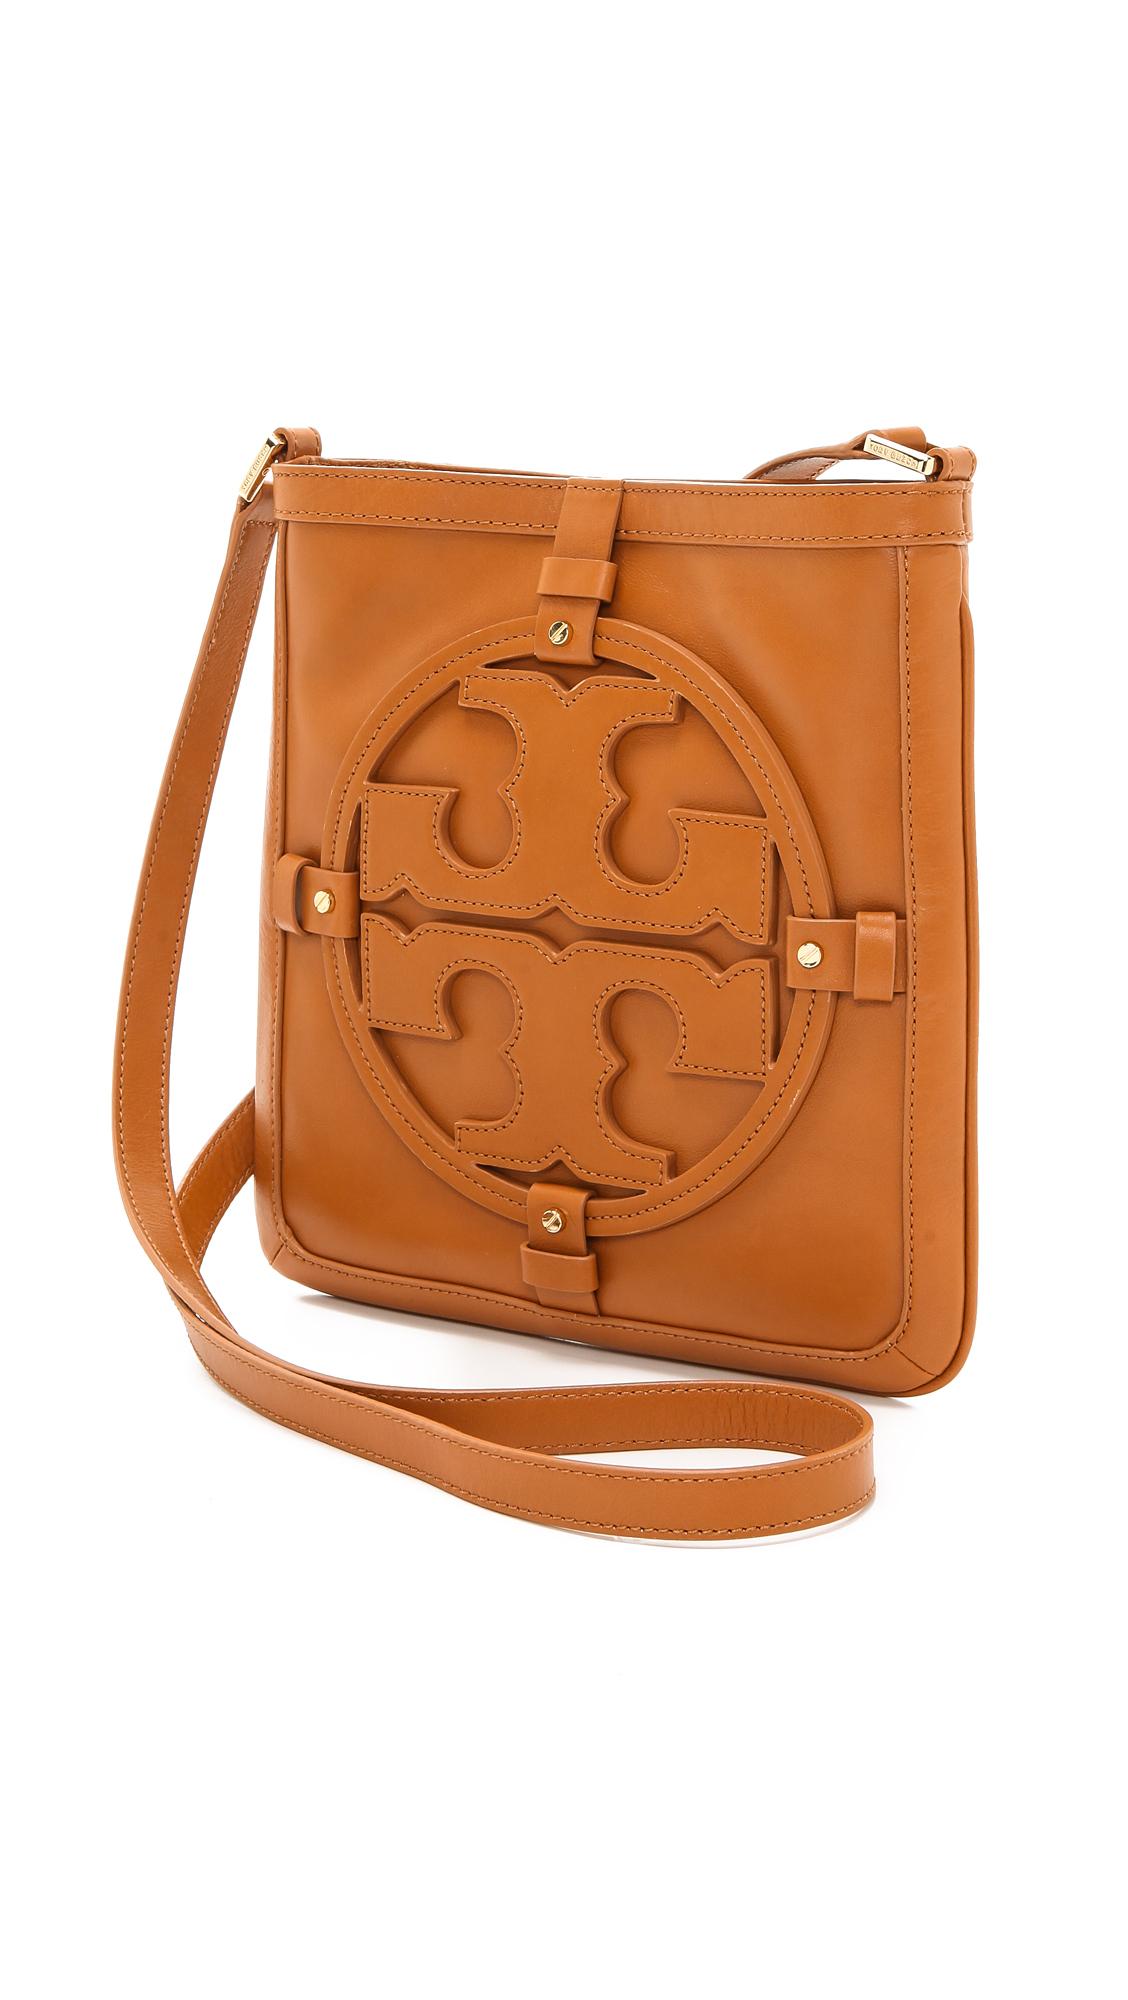 cc768774ca0 Lyst - Tory Burch Holly Book Bag in Brown